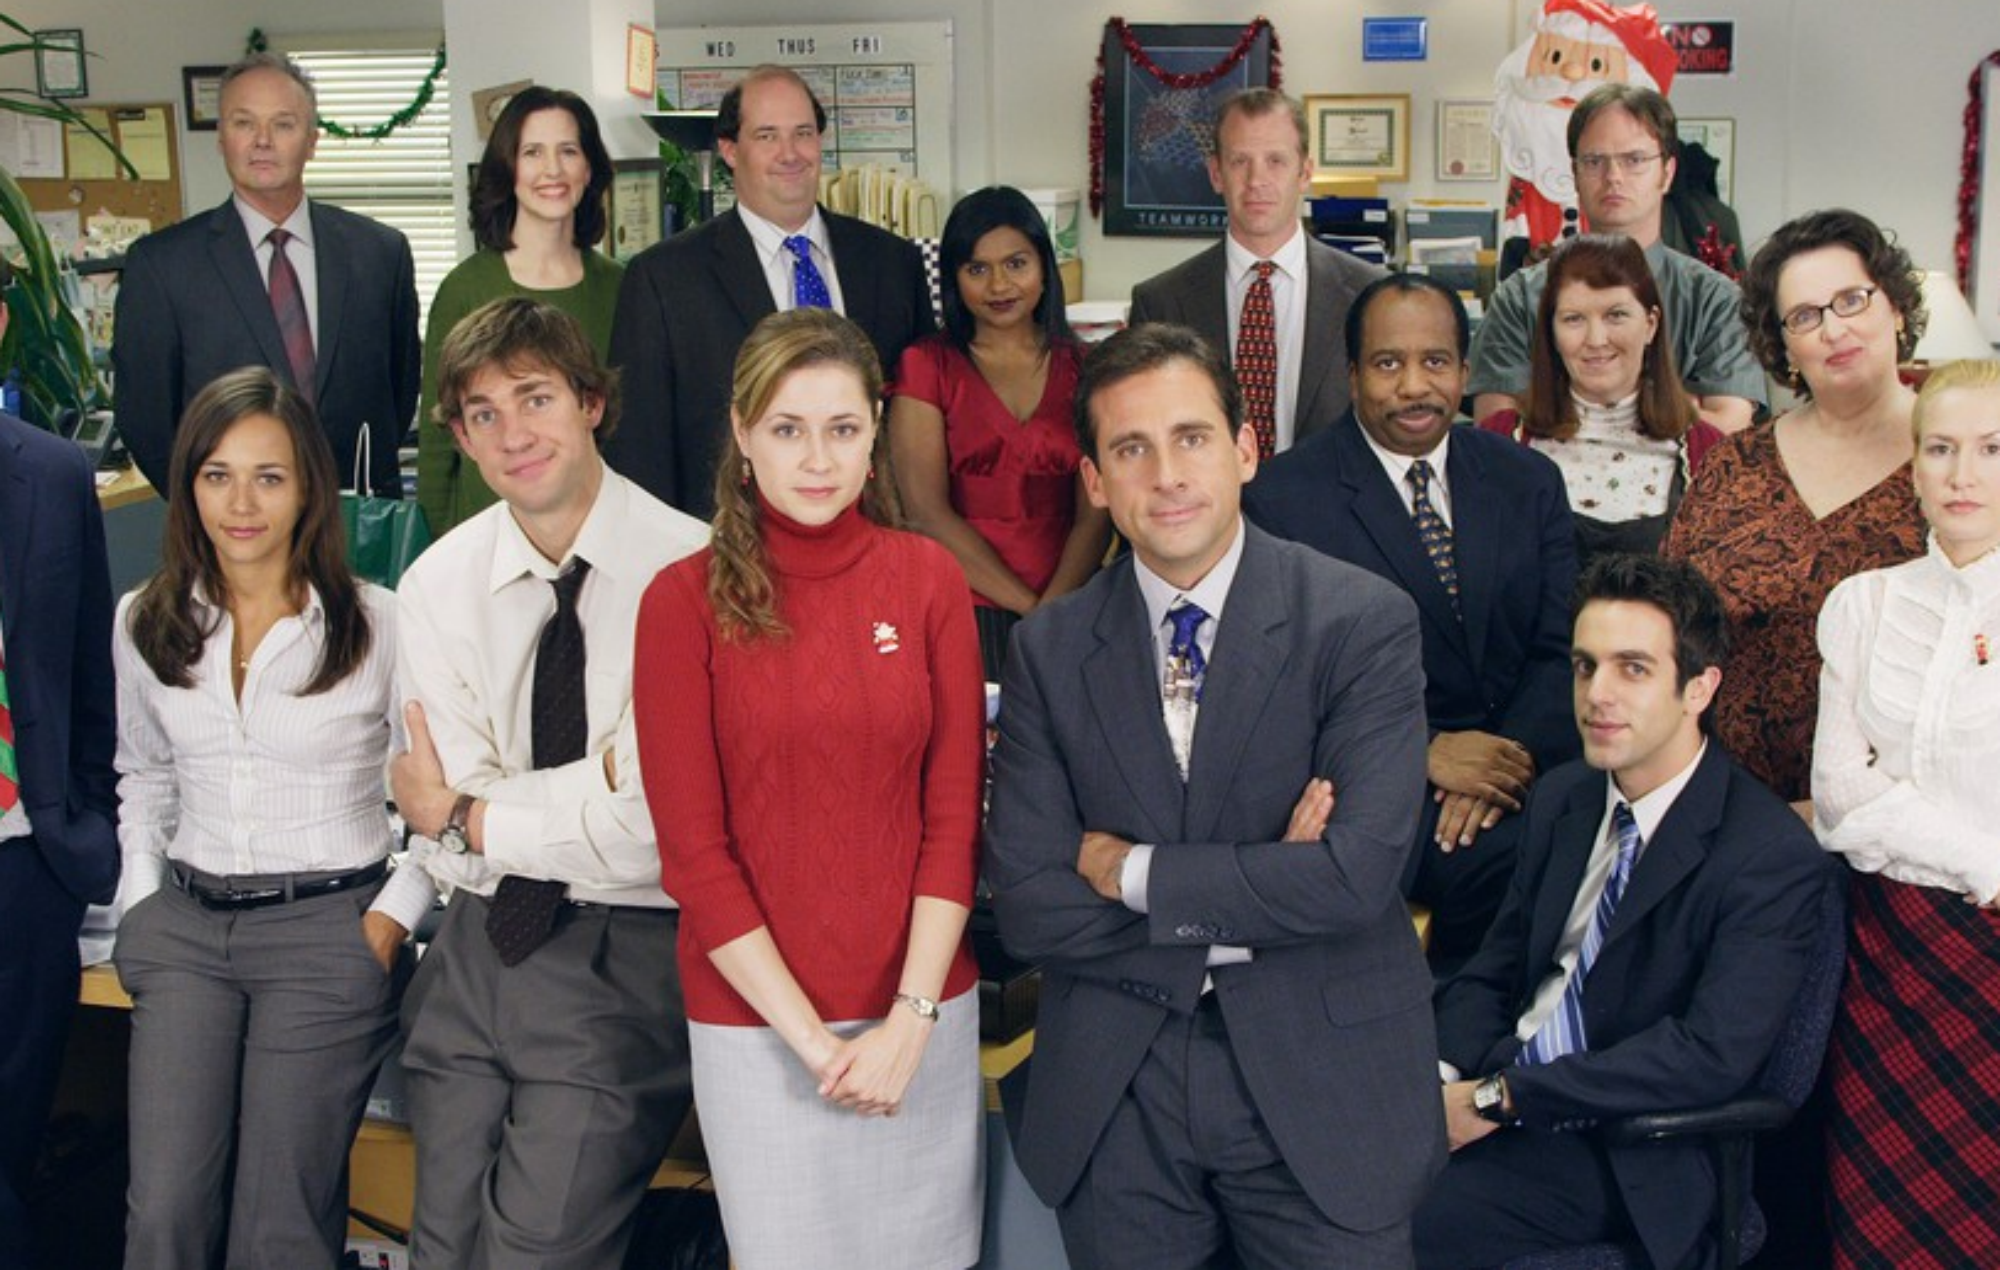 John Krasinski reunites with 'The Office' cast to do show's wedding dance